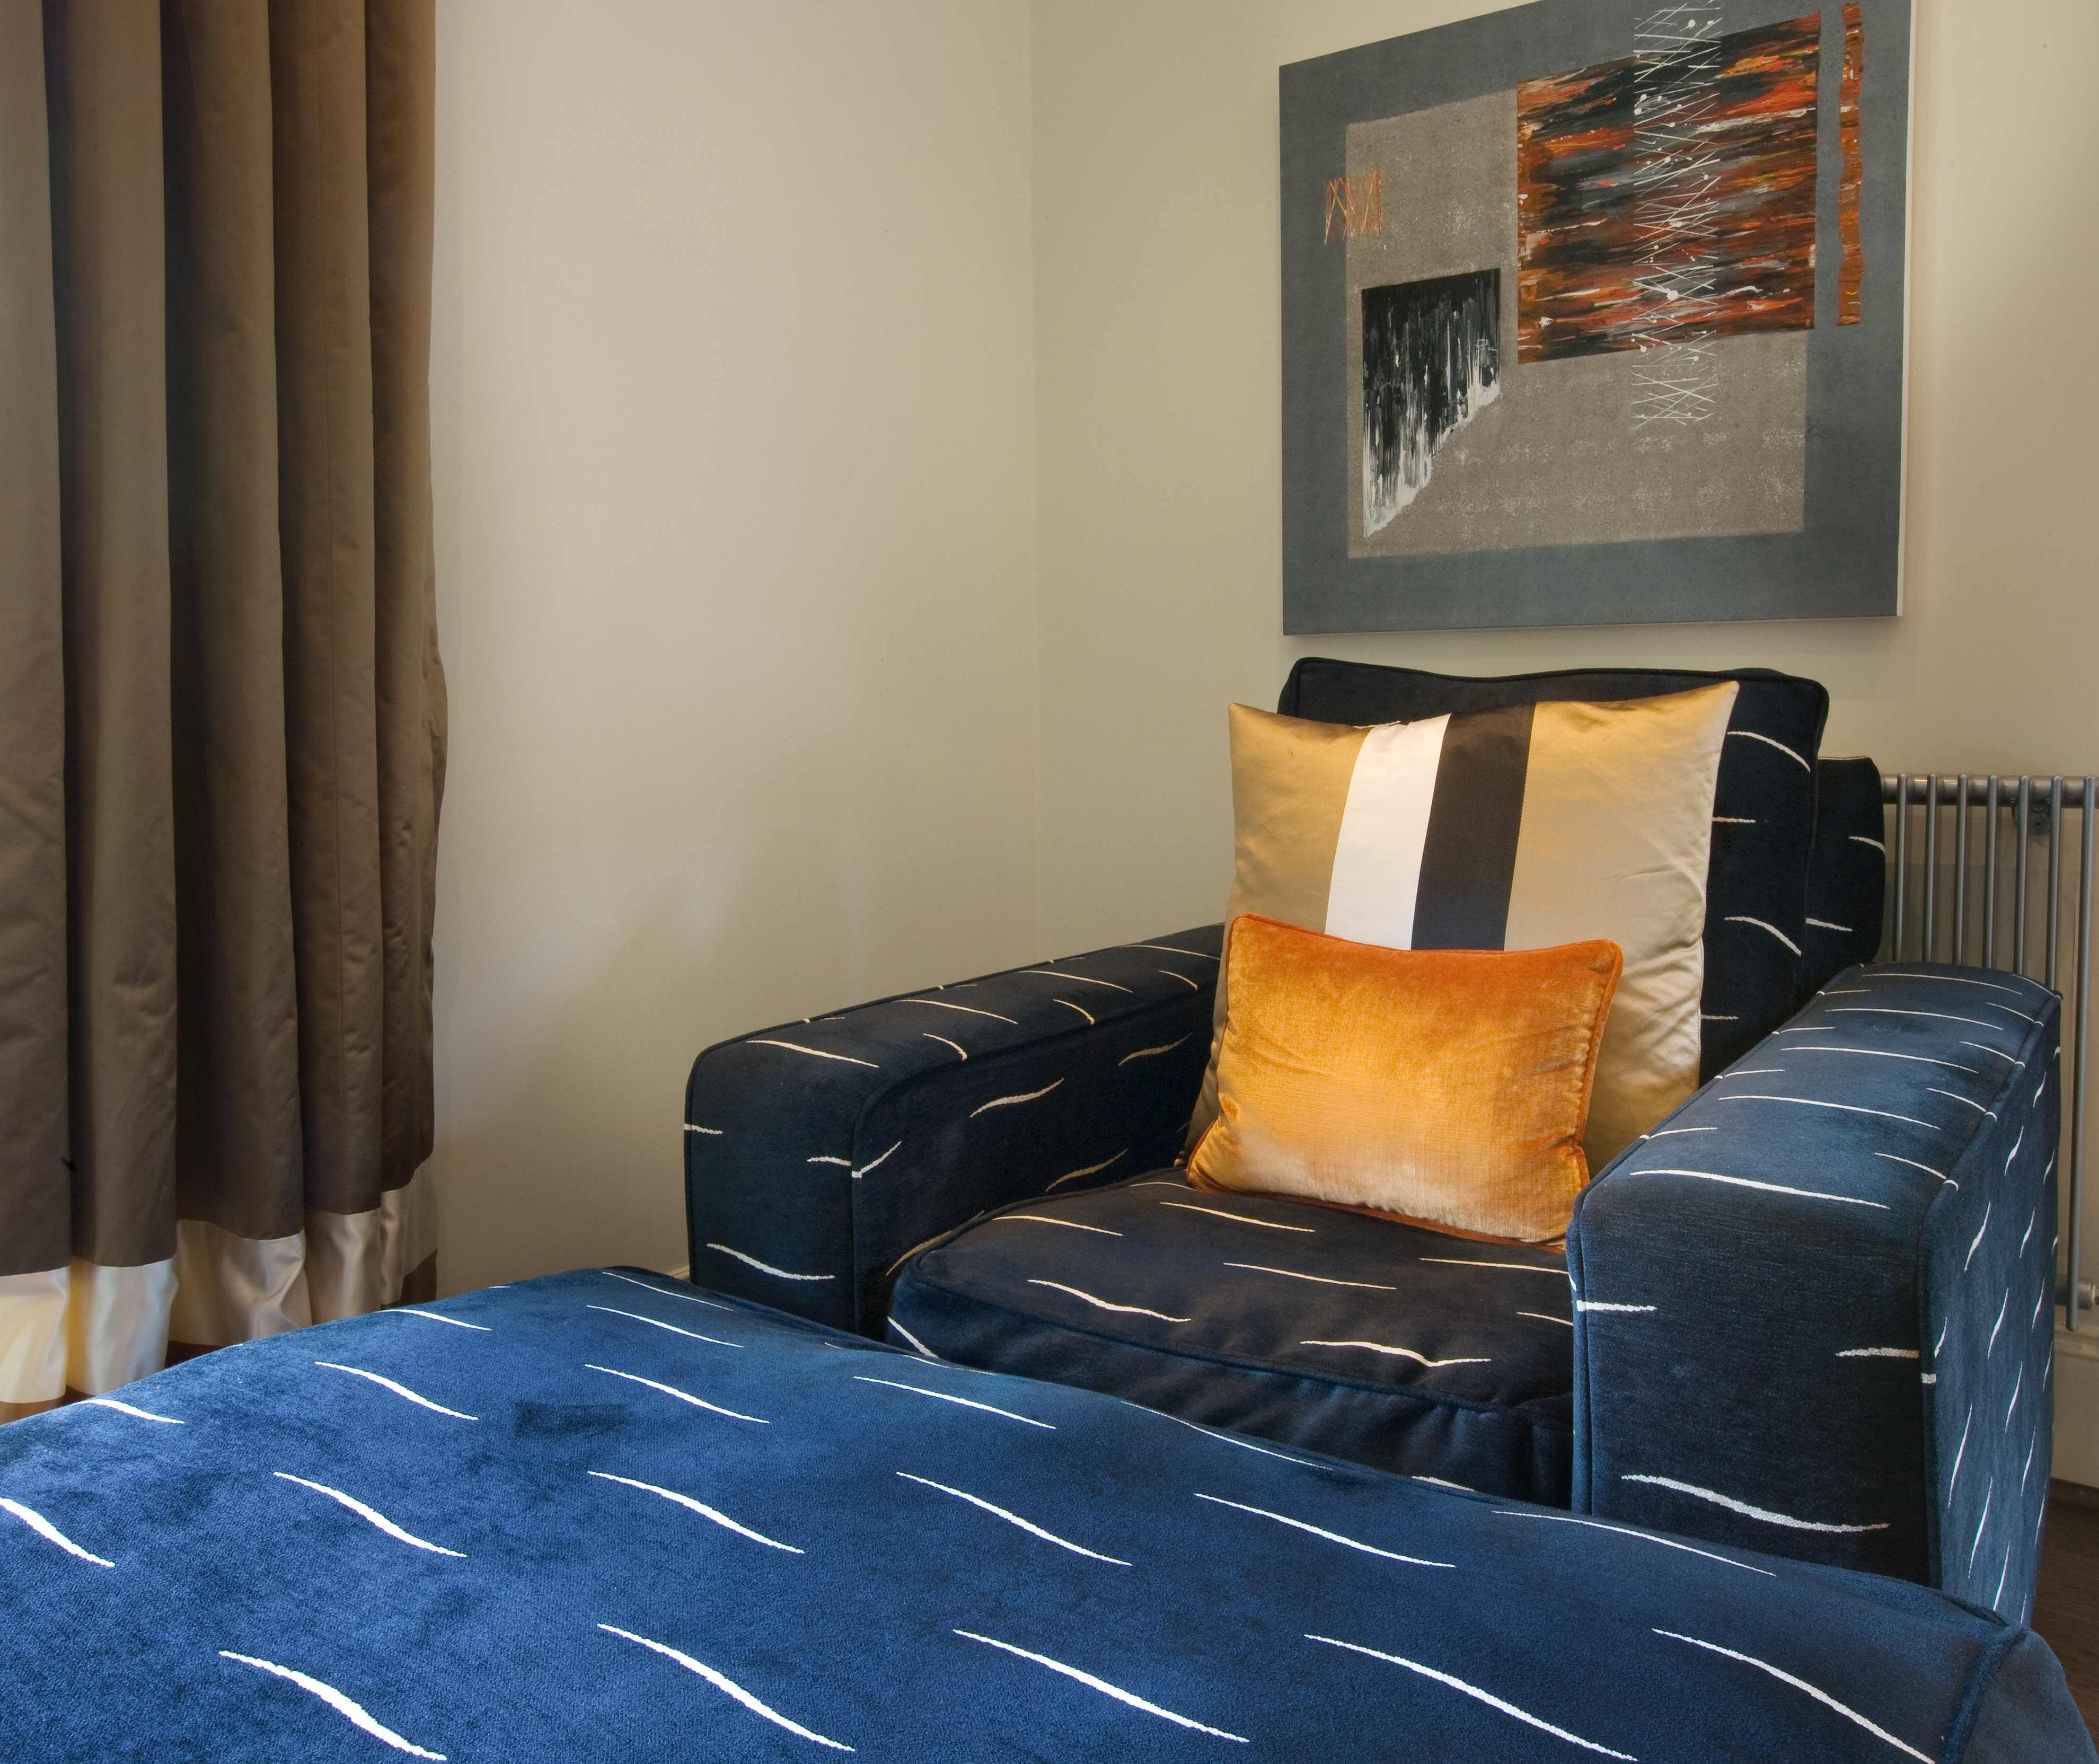 Living Portfolio - John Charles interiors www.johncharlesinteriors.co.uk #interiors #home #design